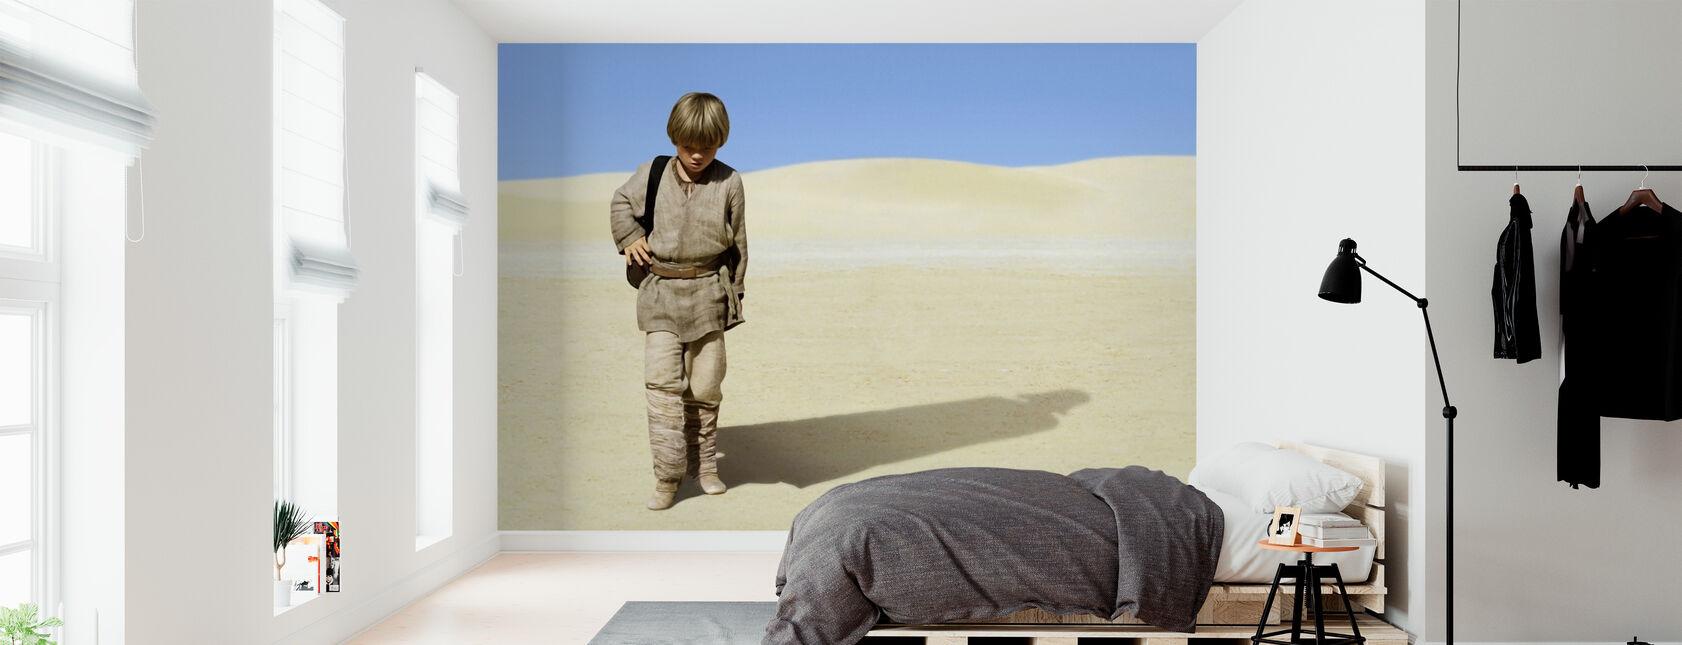 Star Wars – afsnit 1